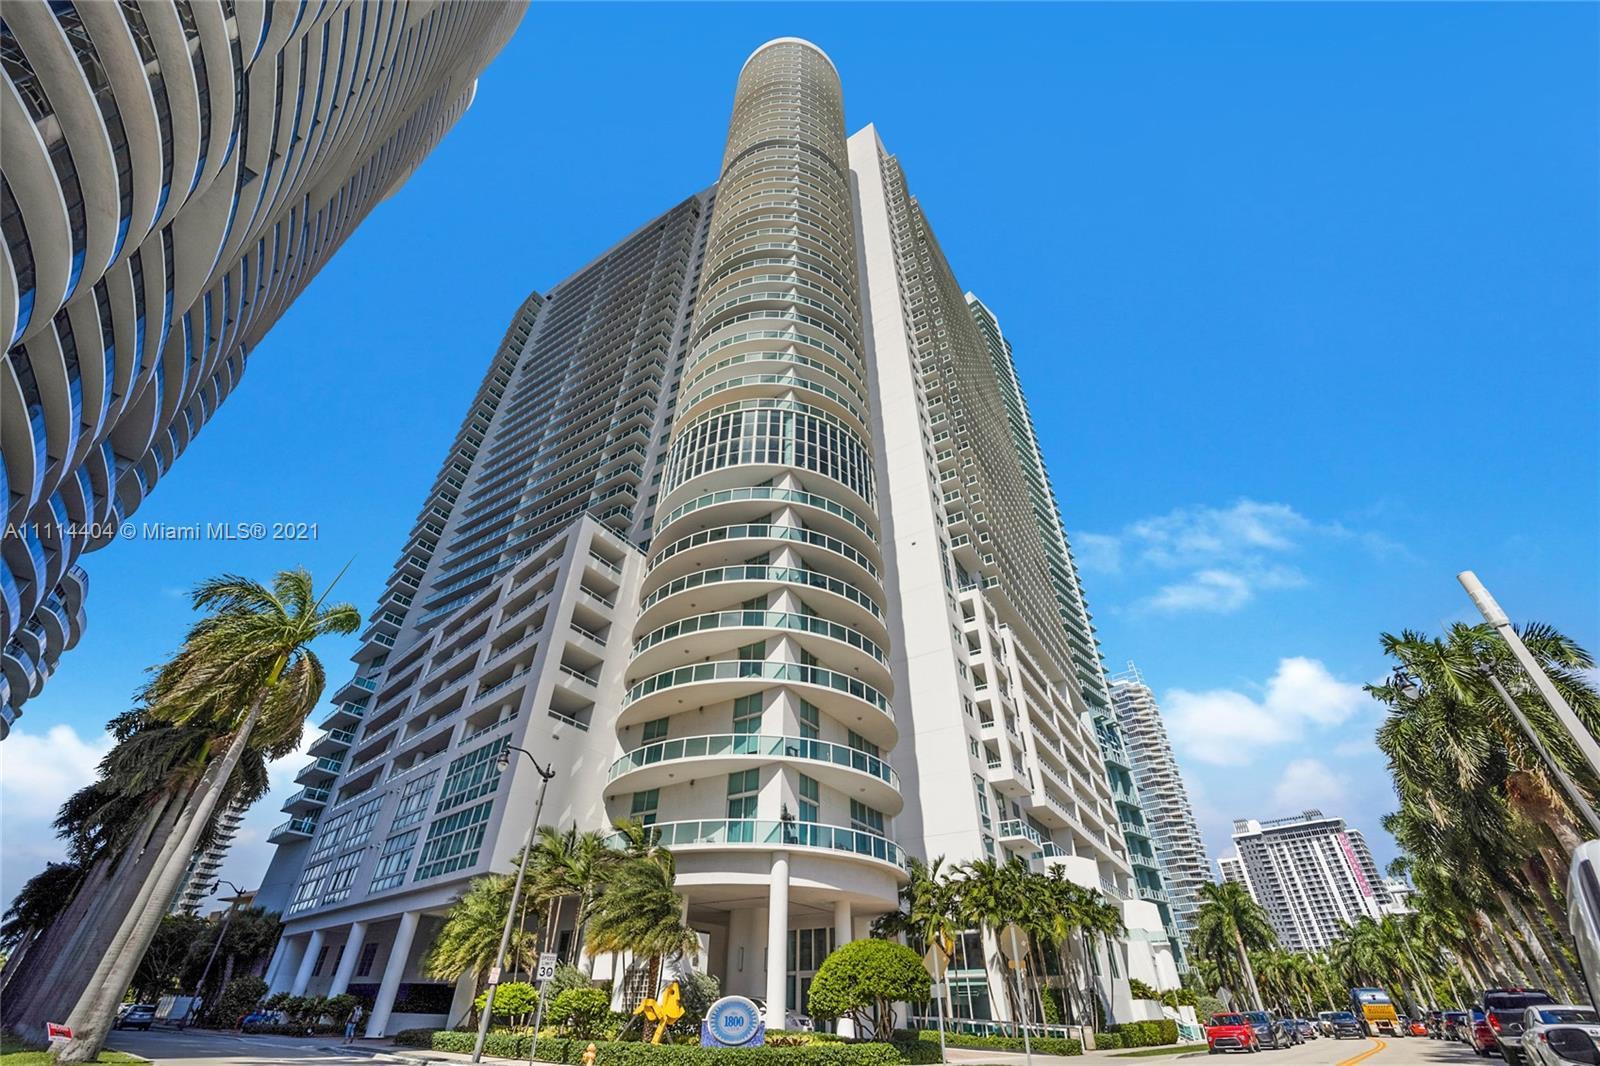 Spectacular 2/2 split floor plan unit in the 05 line of the amazing 1800 Club Condo building in soug